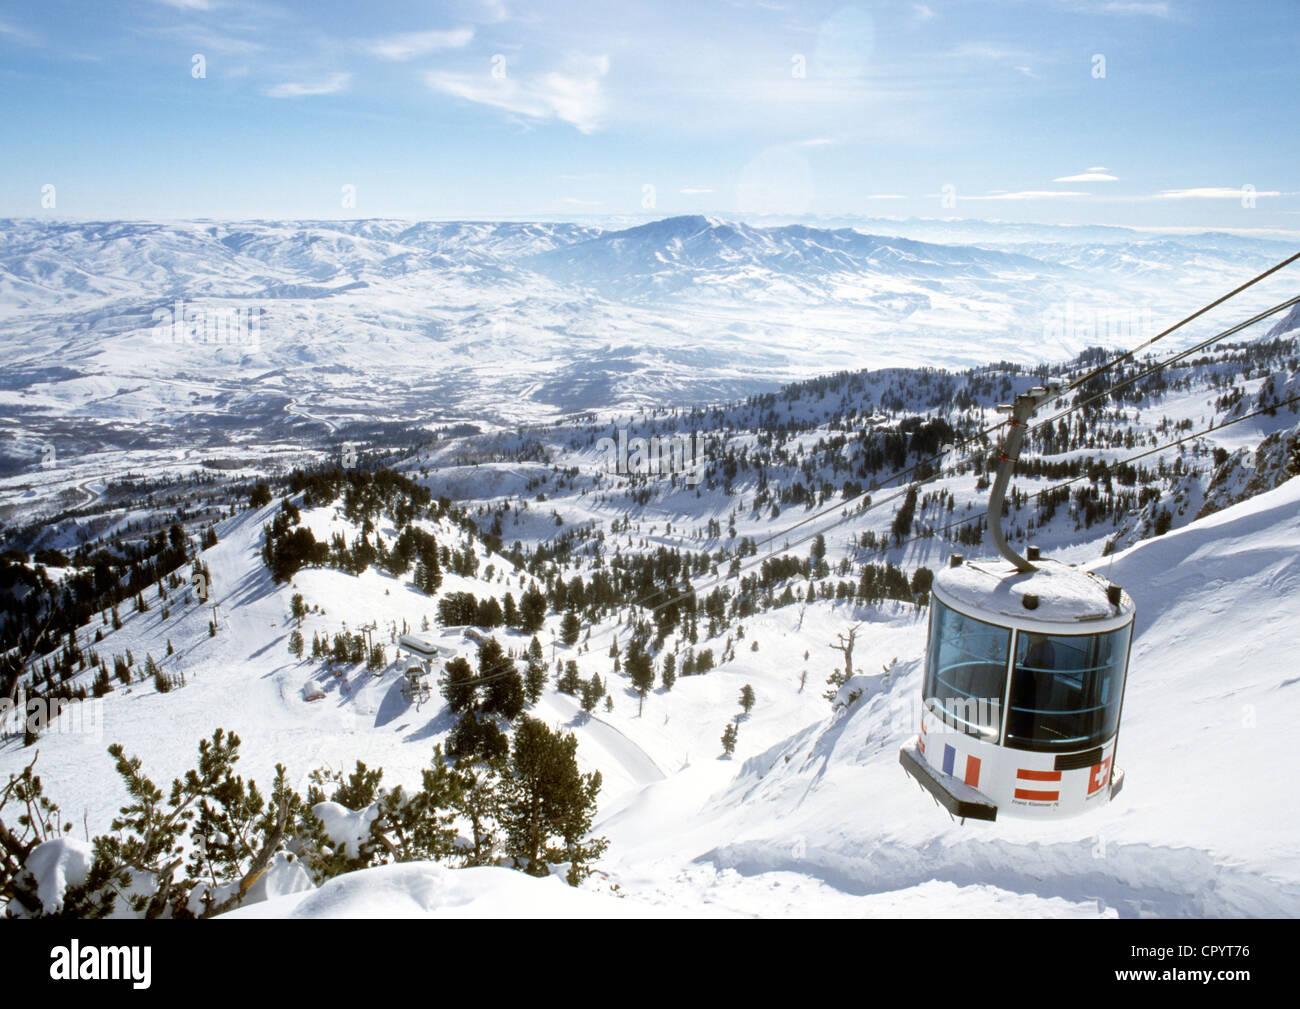 united states, utah, snowbasin ski resort stock photo: 48554890 - alamy